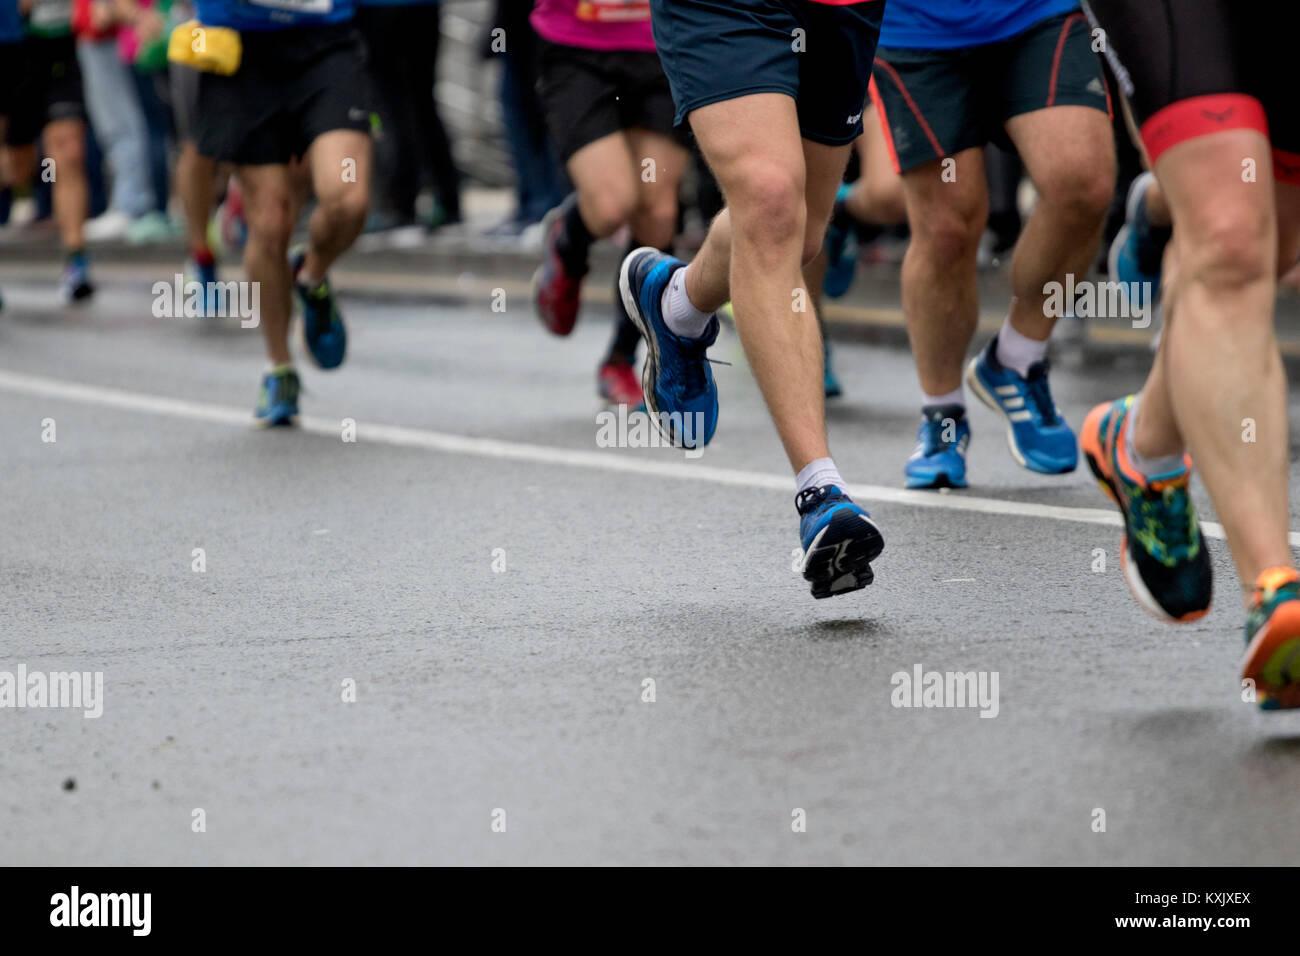 Group of runners from Behobia-Donostia marathon 2017 (Euskadi, Spain). - Stock Image